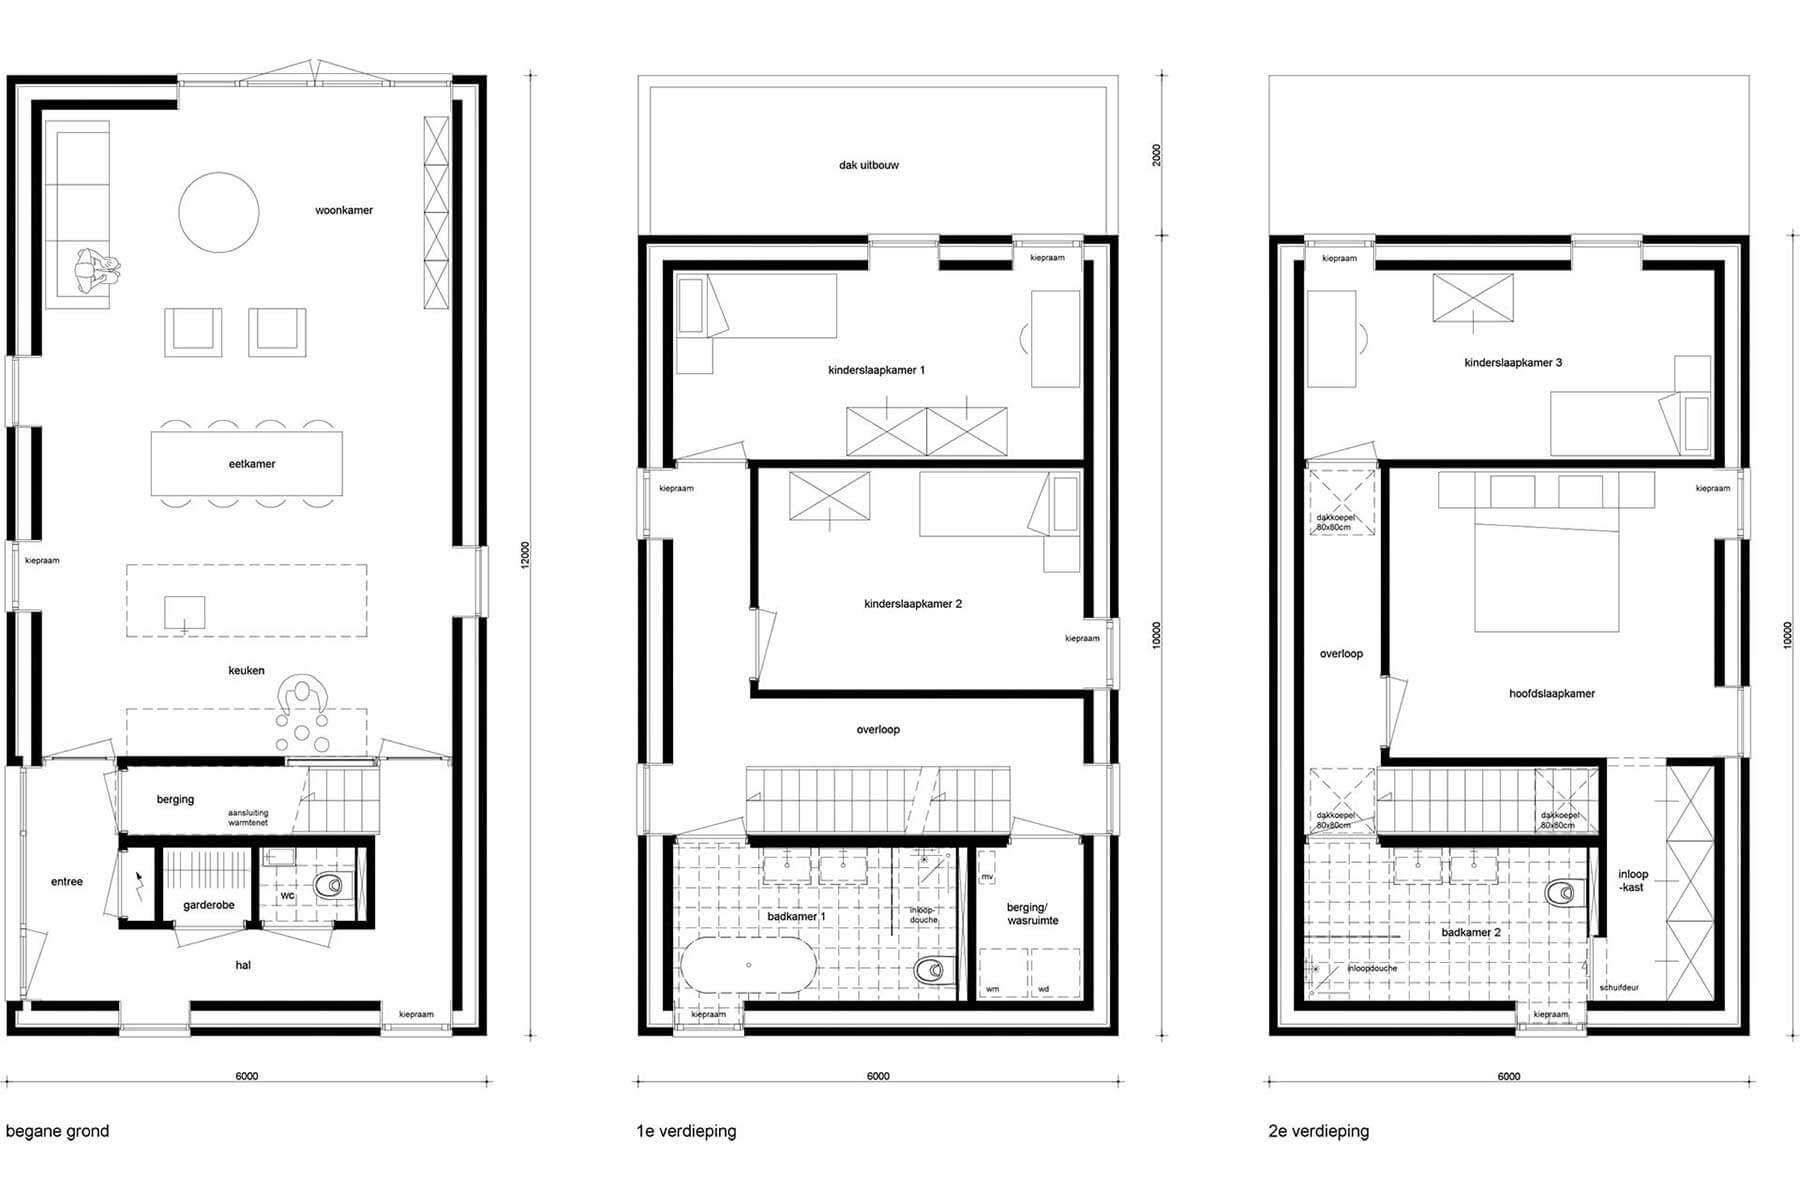 8A-Architecten-Brick-house-vrijstaand-12